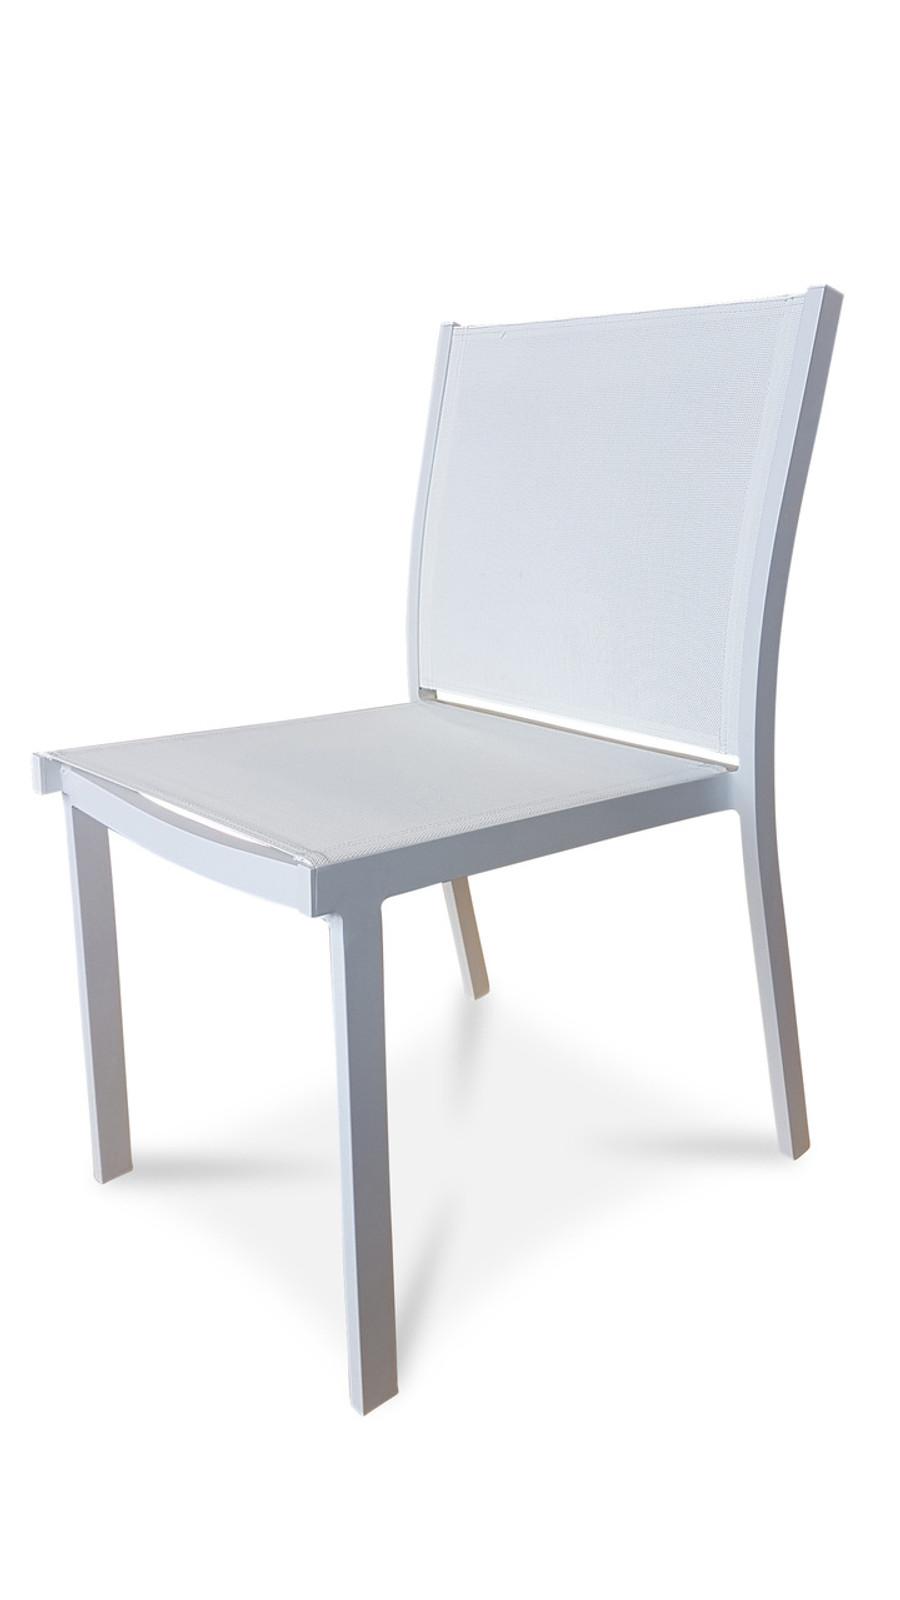 BASIK Dining Chair - Textilene Sling  (Charcoal or White)